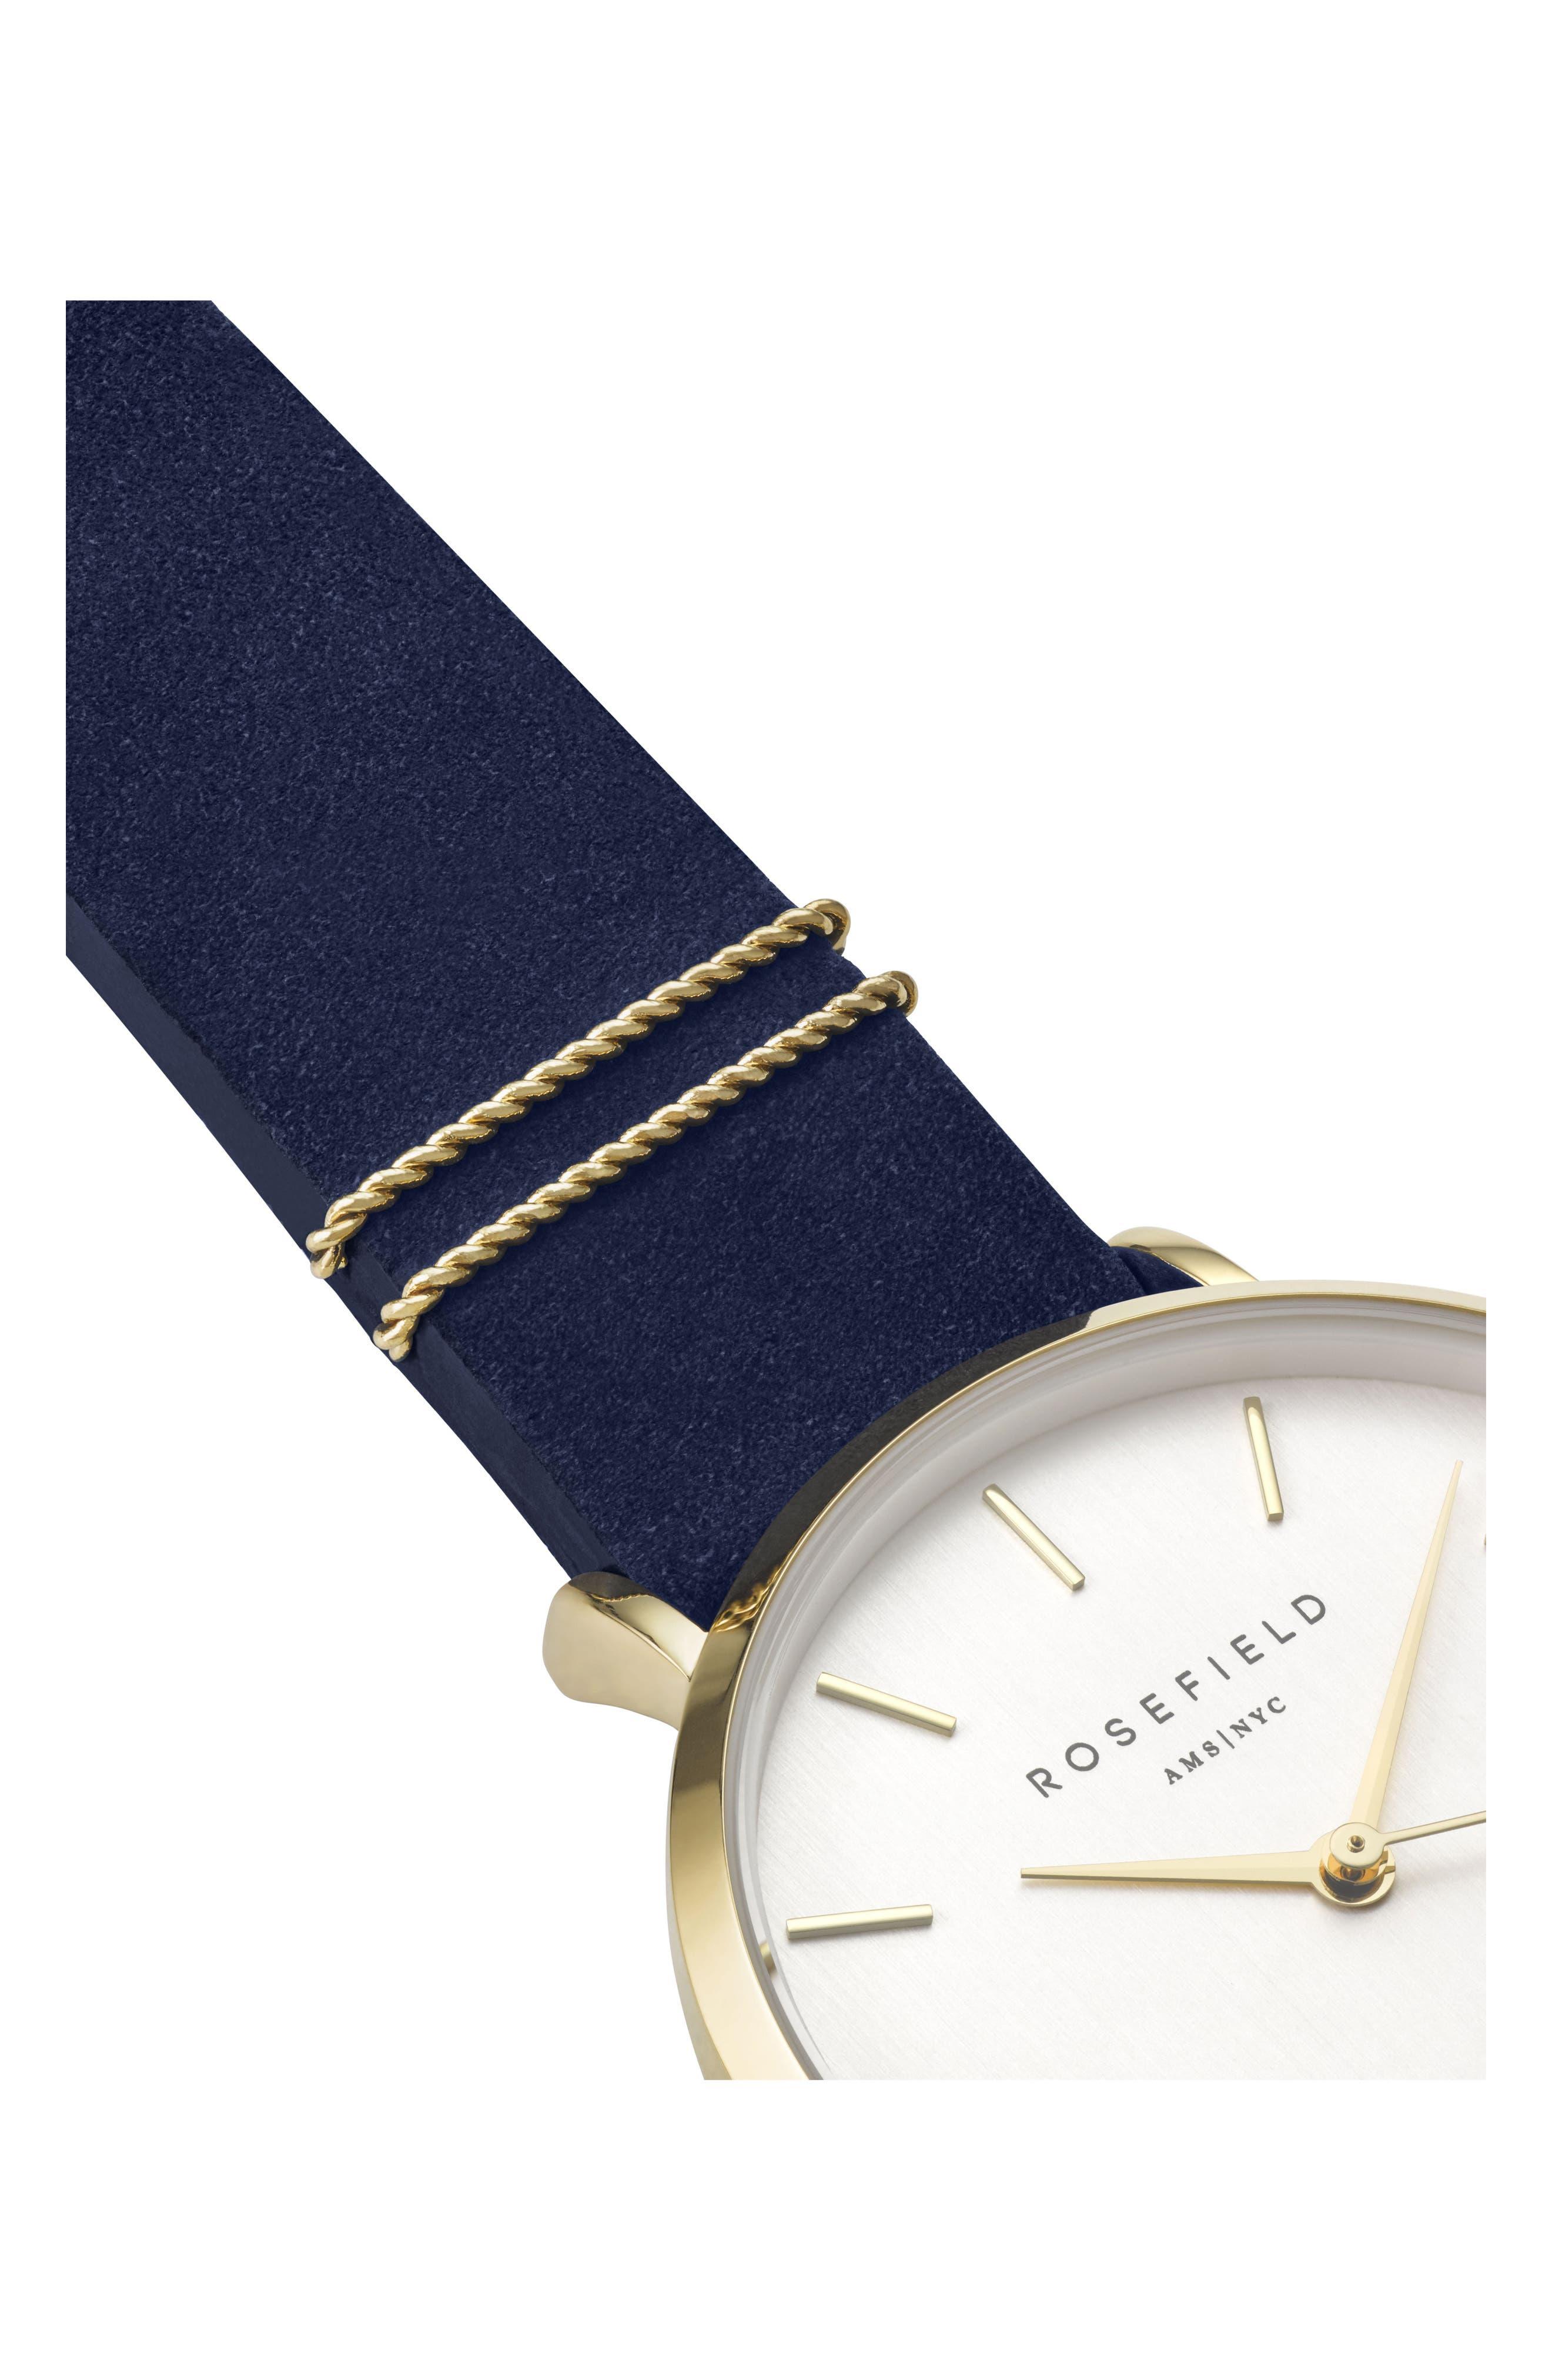 West Village Leather Strap Watch, 33mm,                             Alternate thumbnail 3, color,                             BLUE/ WHITE/ GOLD